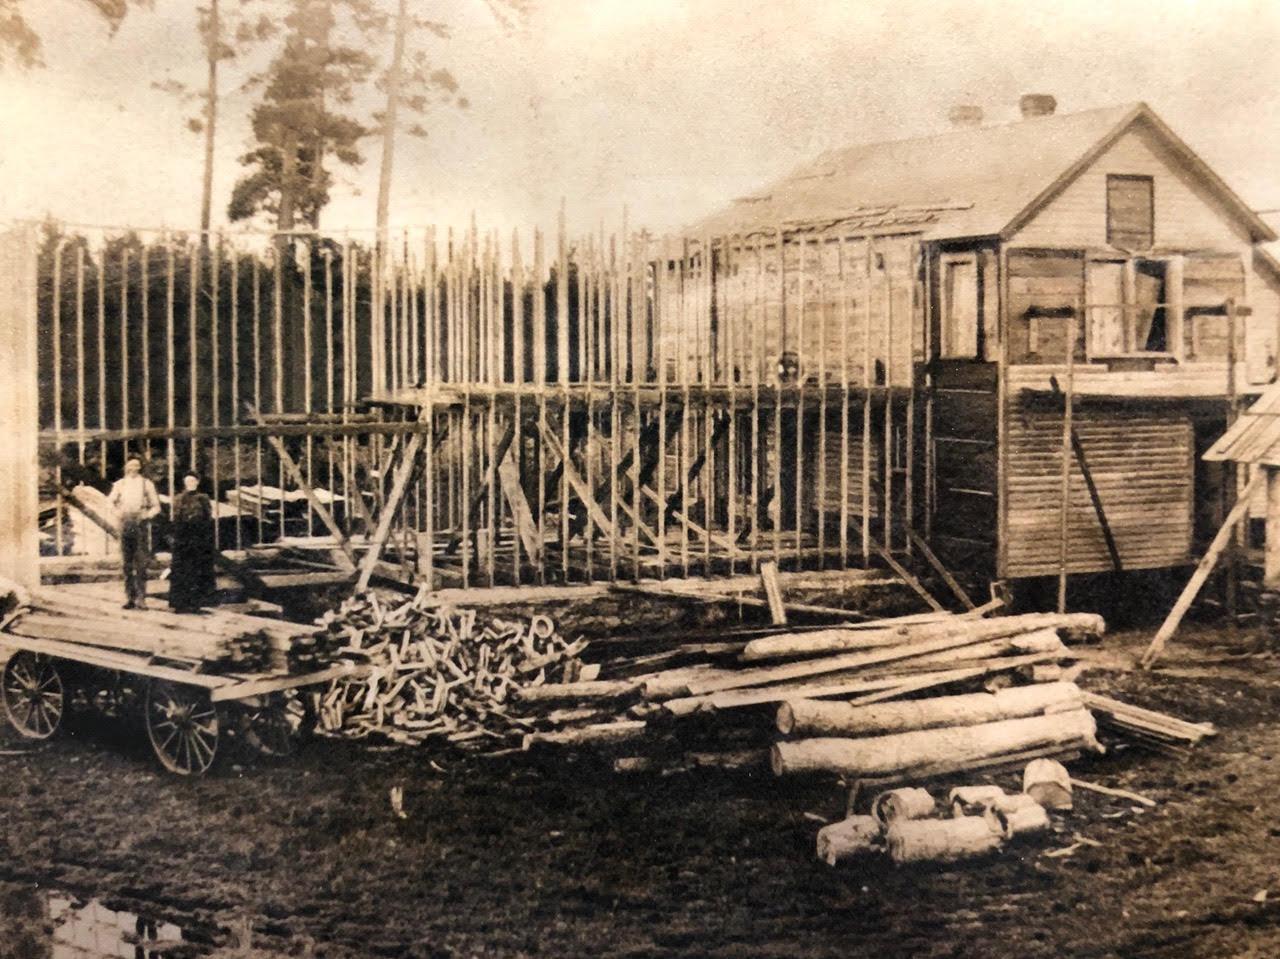 old PINE loDGE